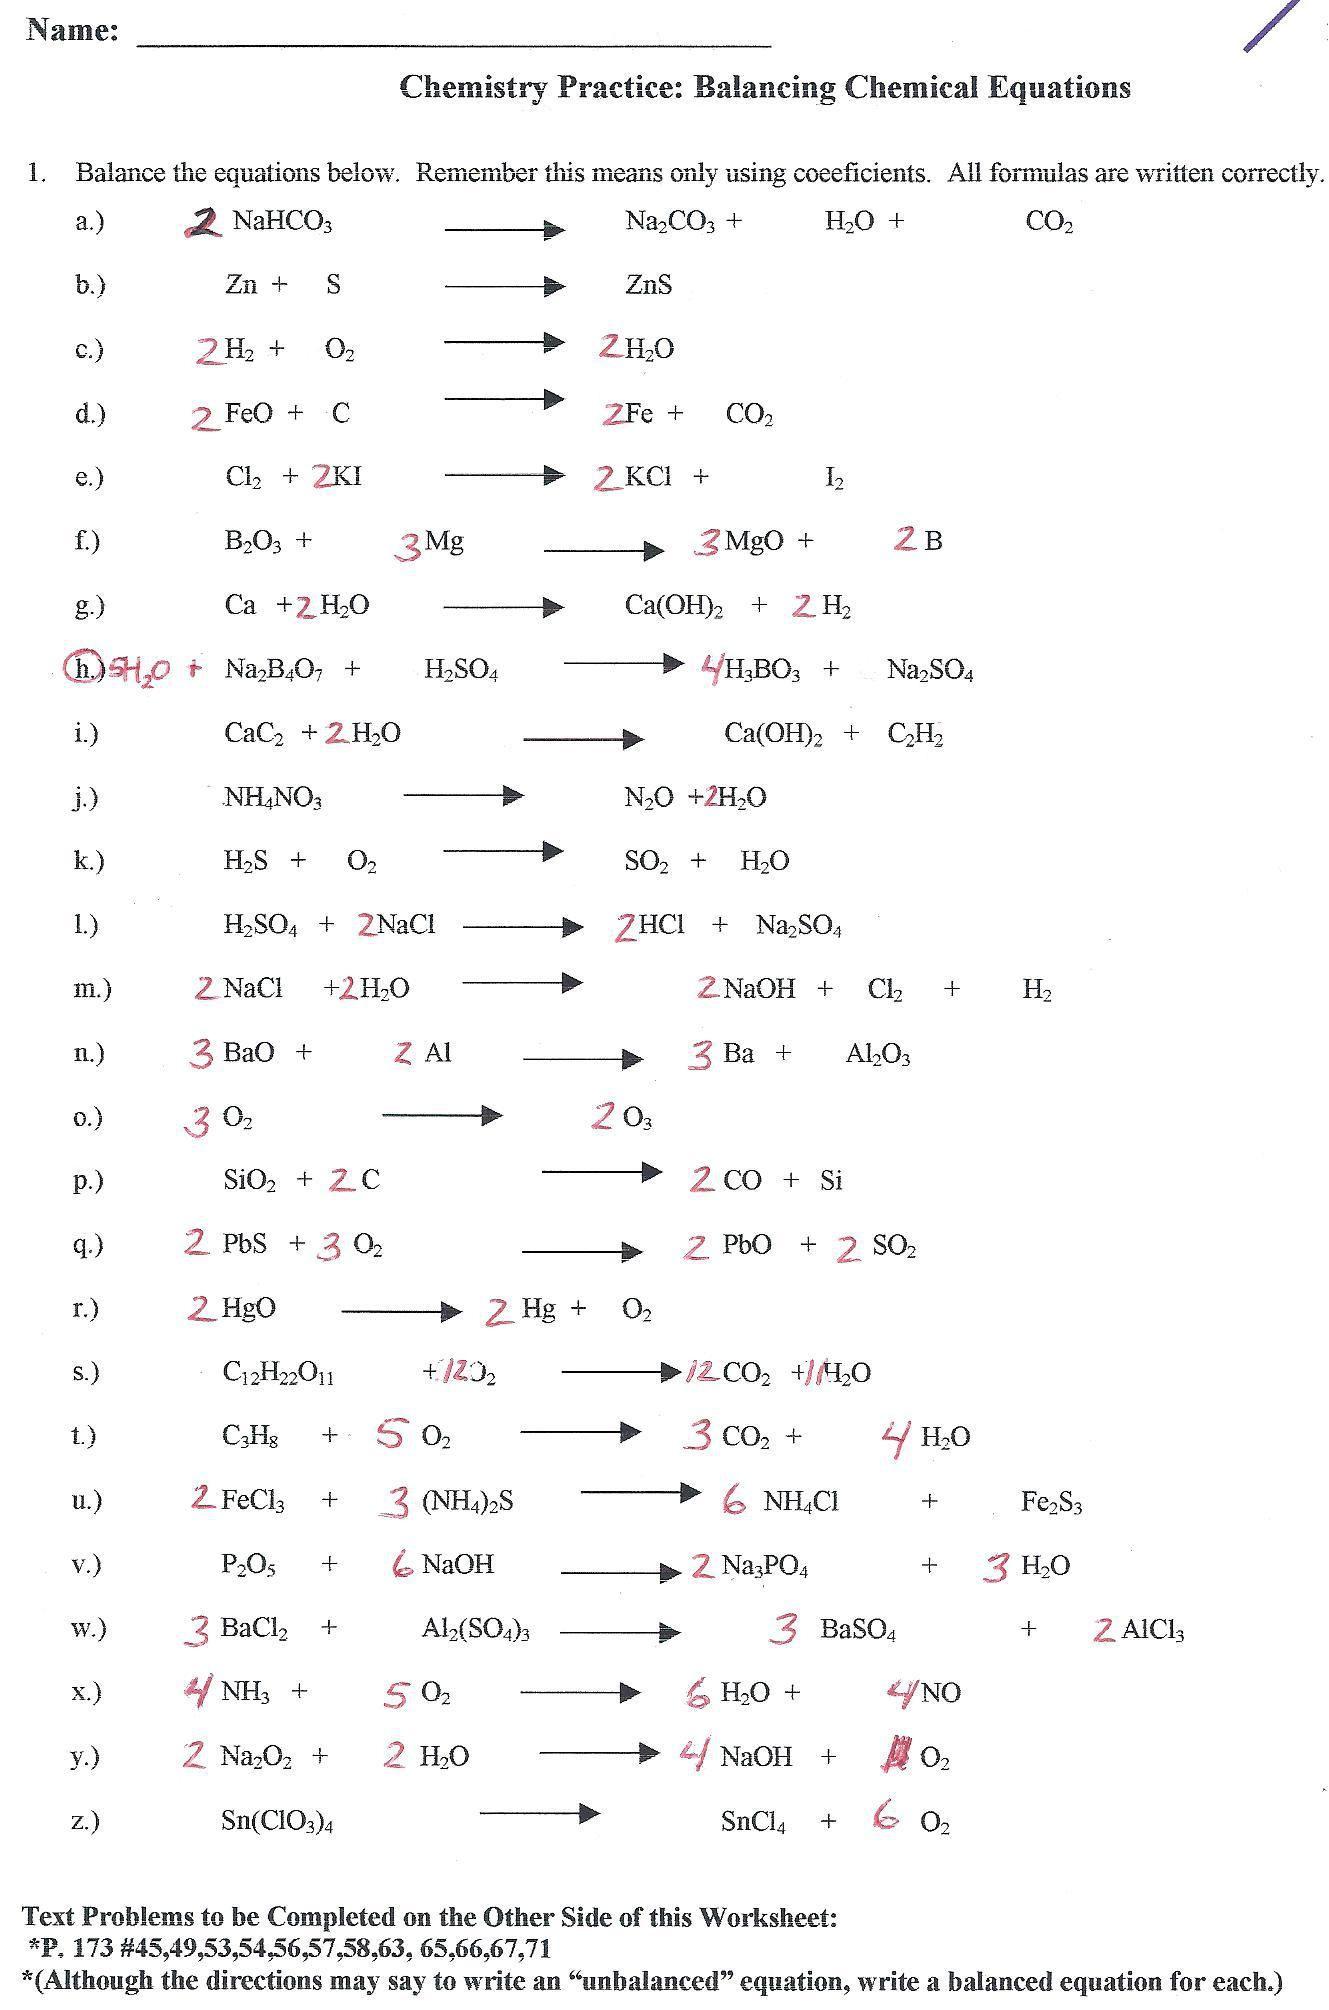 Balancing Equations Race Worksheet Answers — db-excel.com